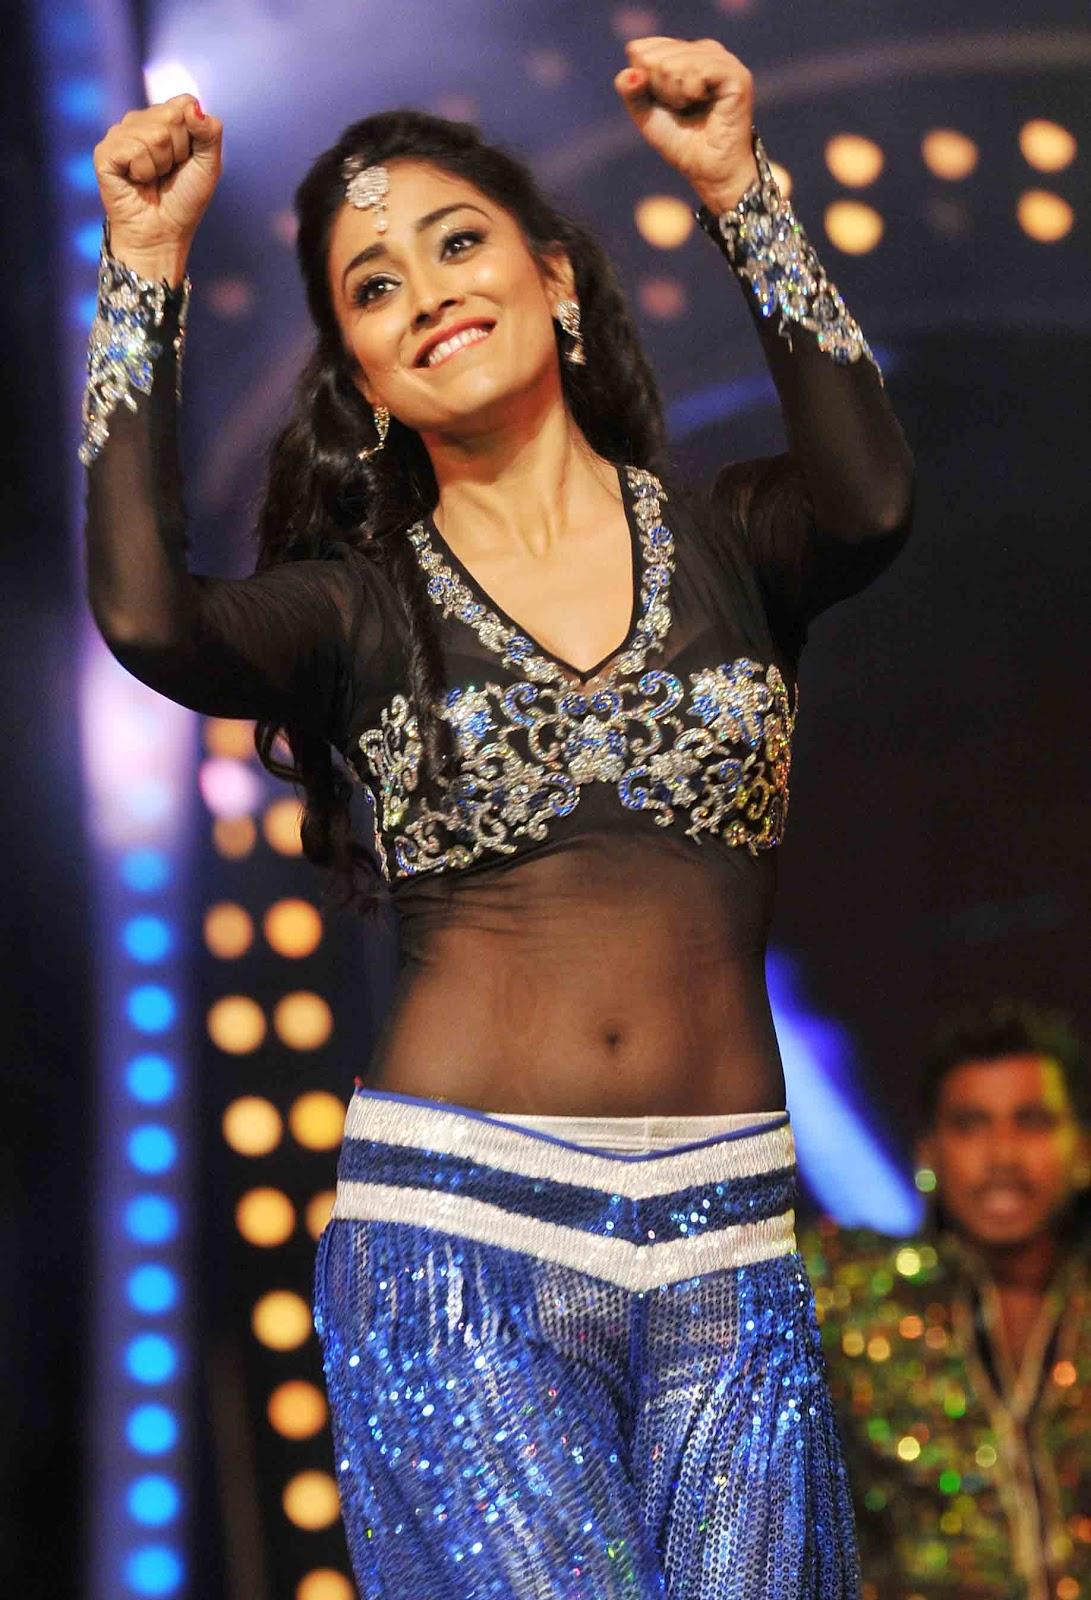 Shriya Saran Hot Navel Stills In Awards 2012 No Watermark